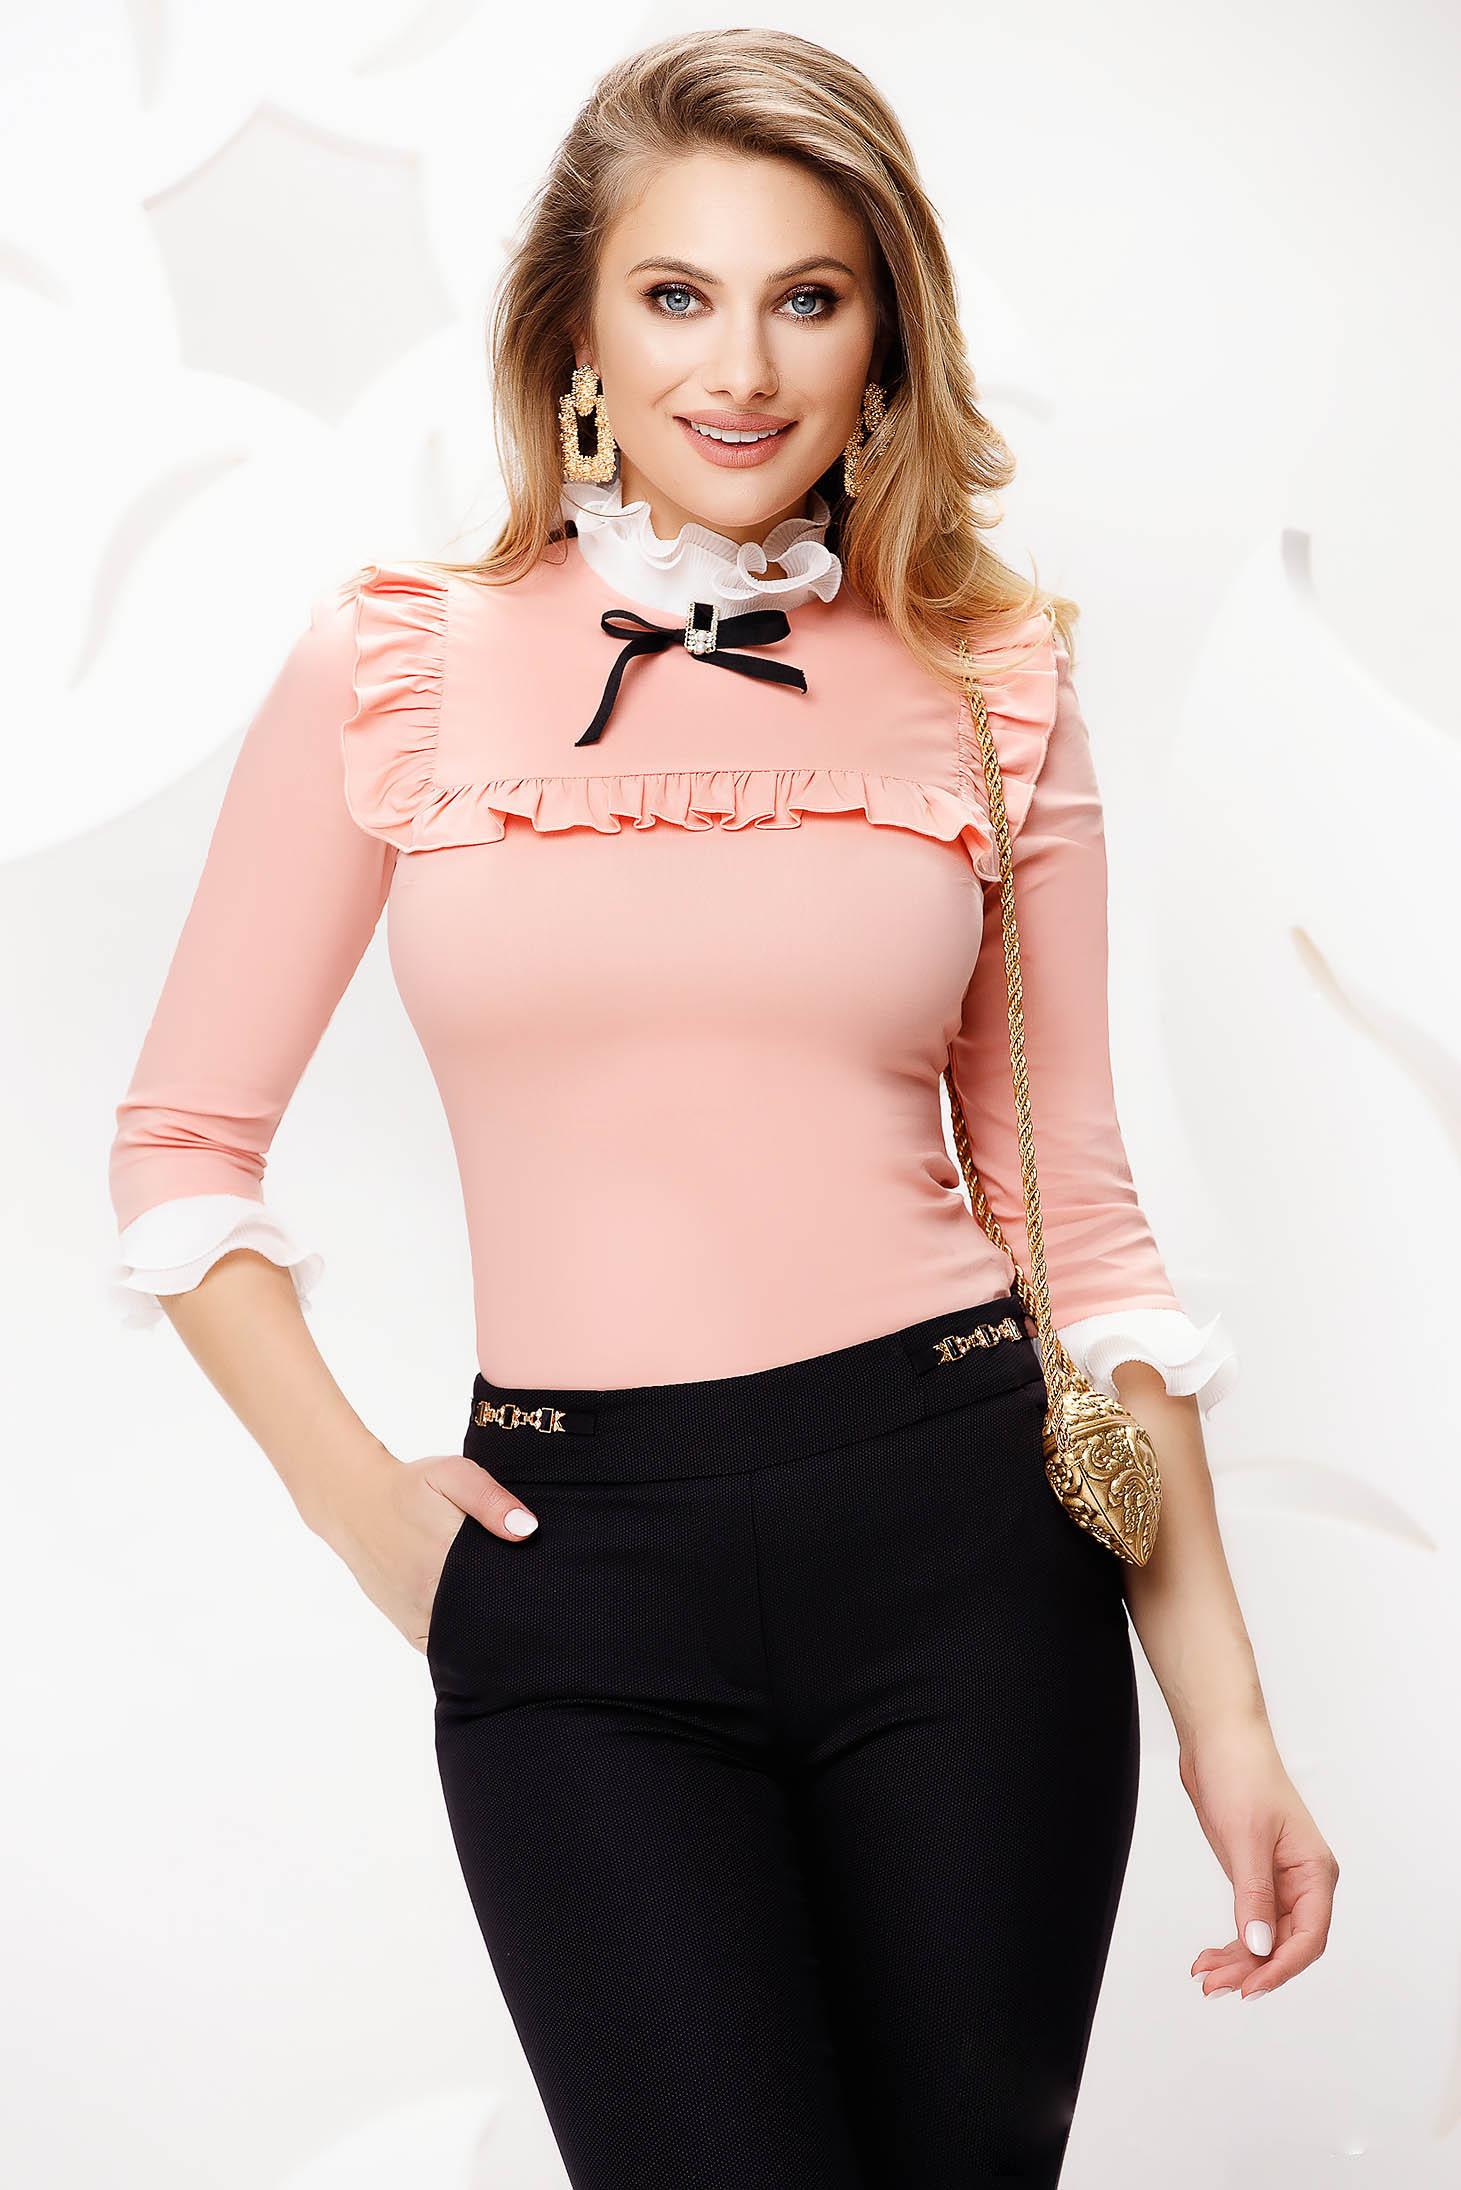 Camasa dama Fofy piersica office cambrata din material usor elastic accesorizata cu fundite si volanase